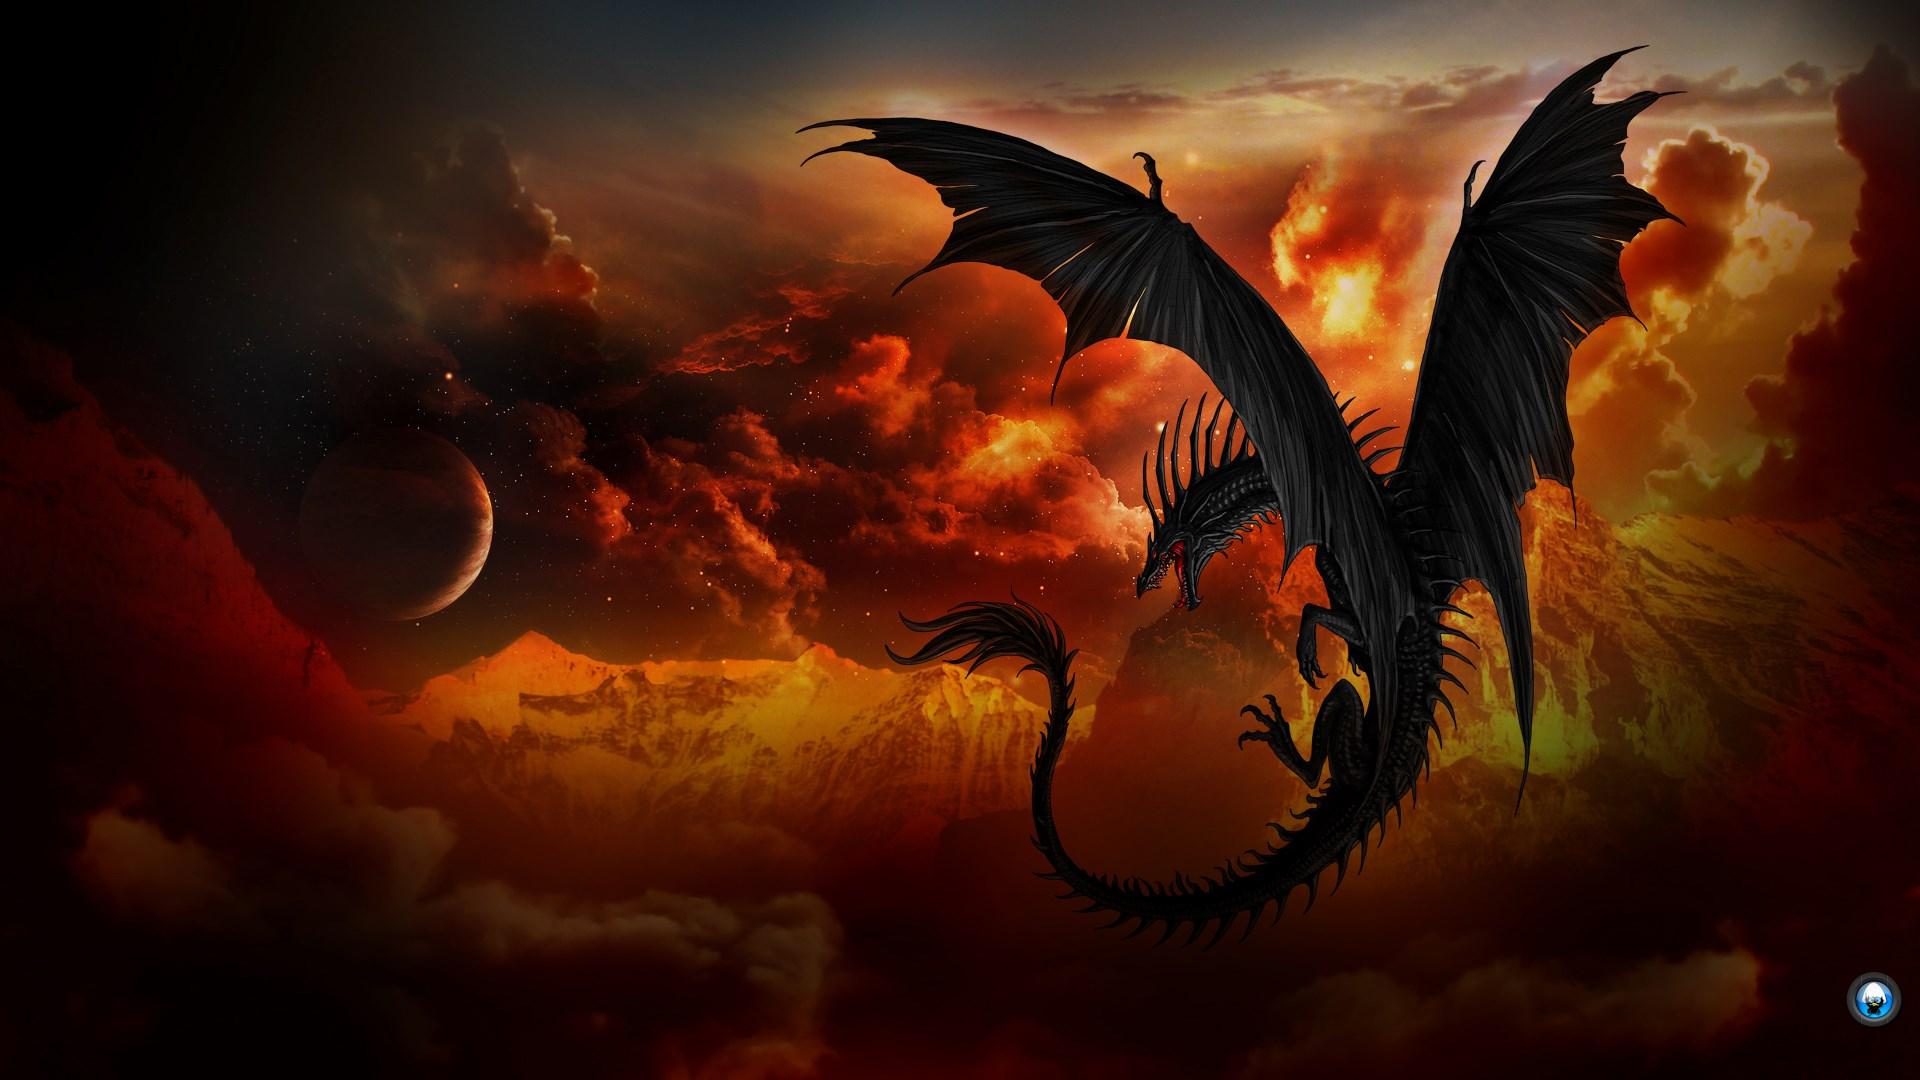 Cool-dragon-Earl-Brook-wallpaper-wp3404155